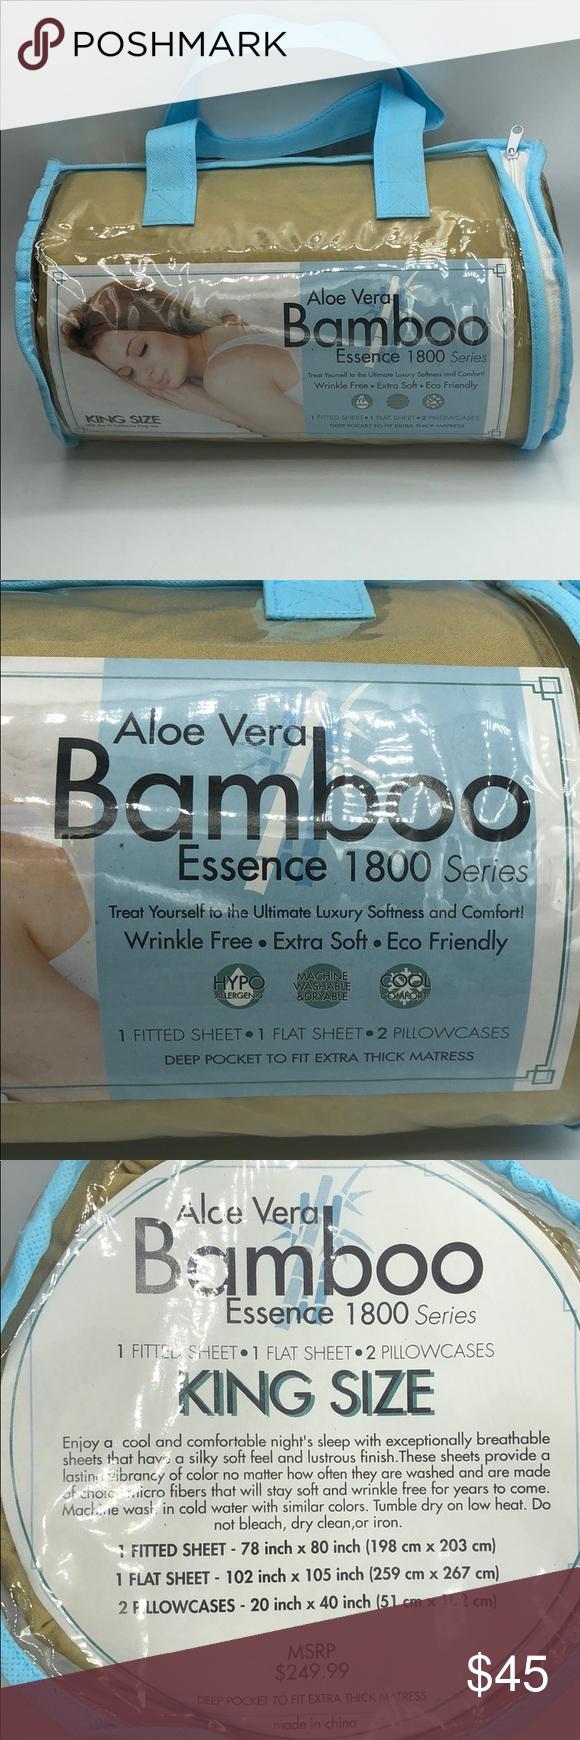 NWT aloe Vera bamboo pillow king size